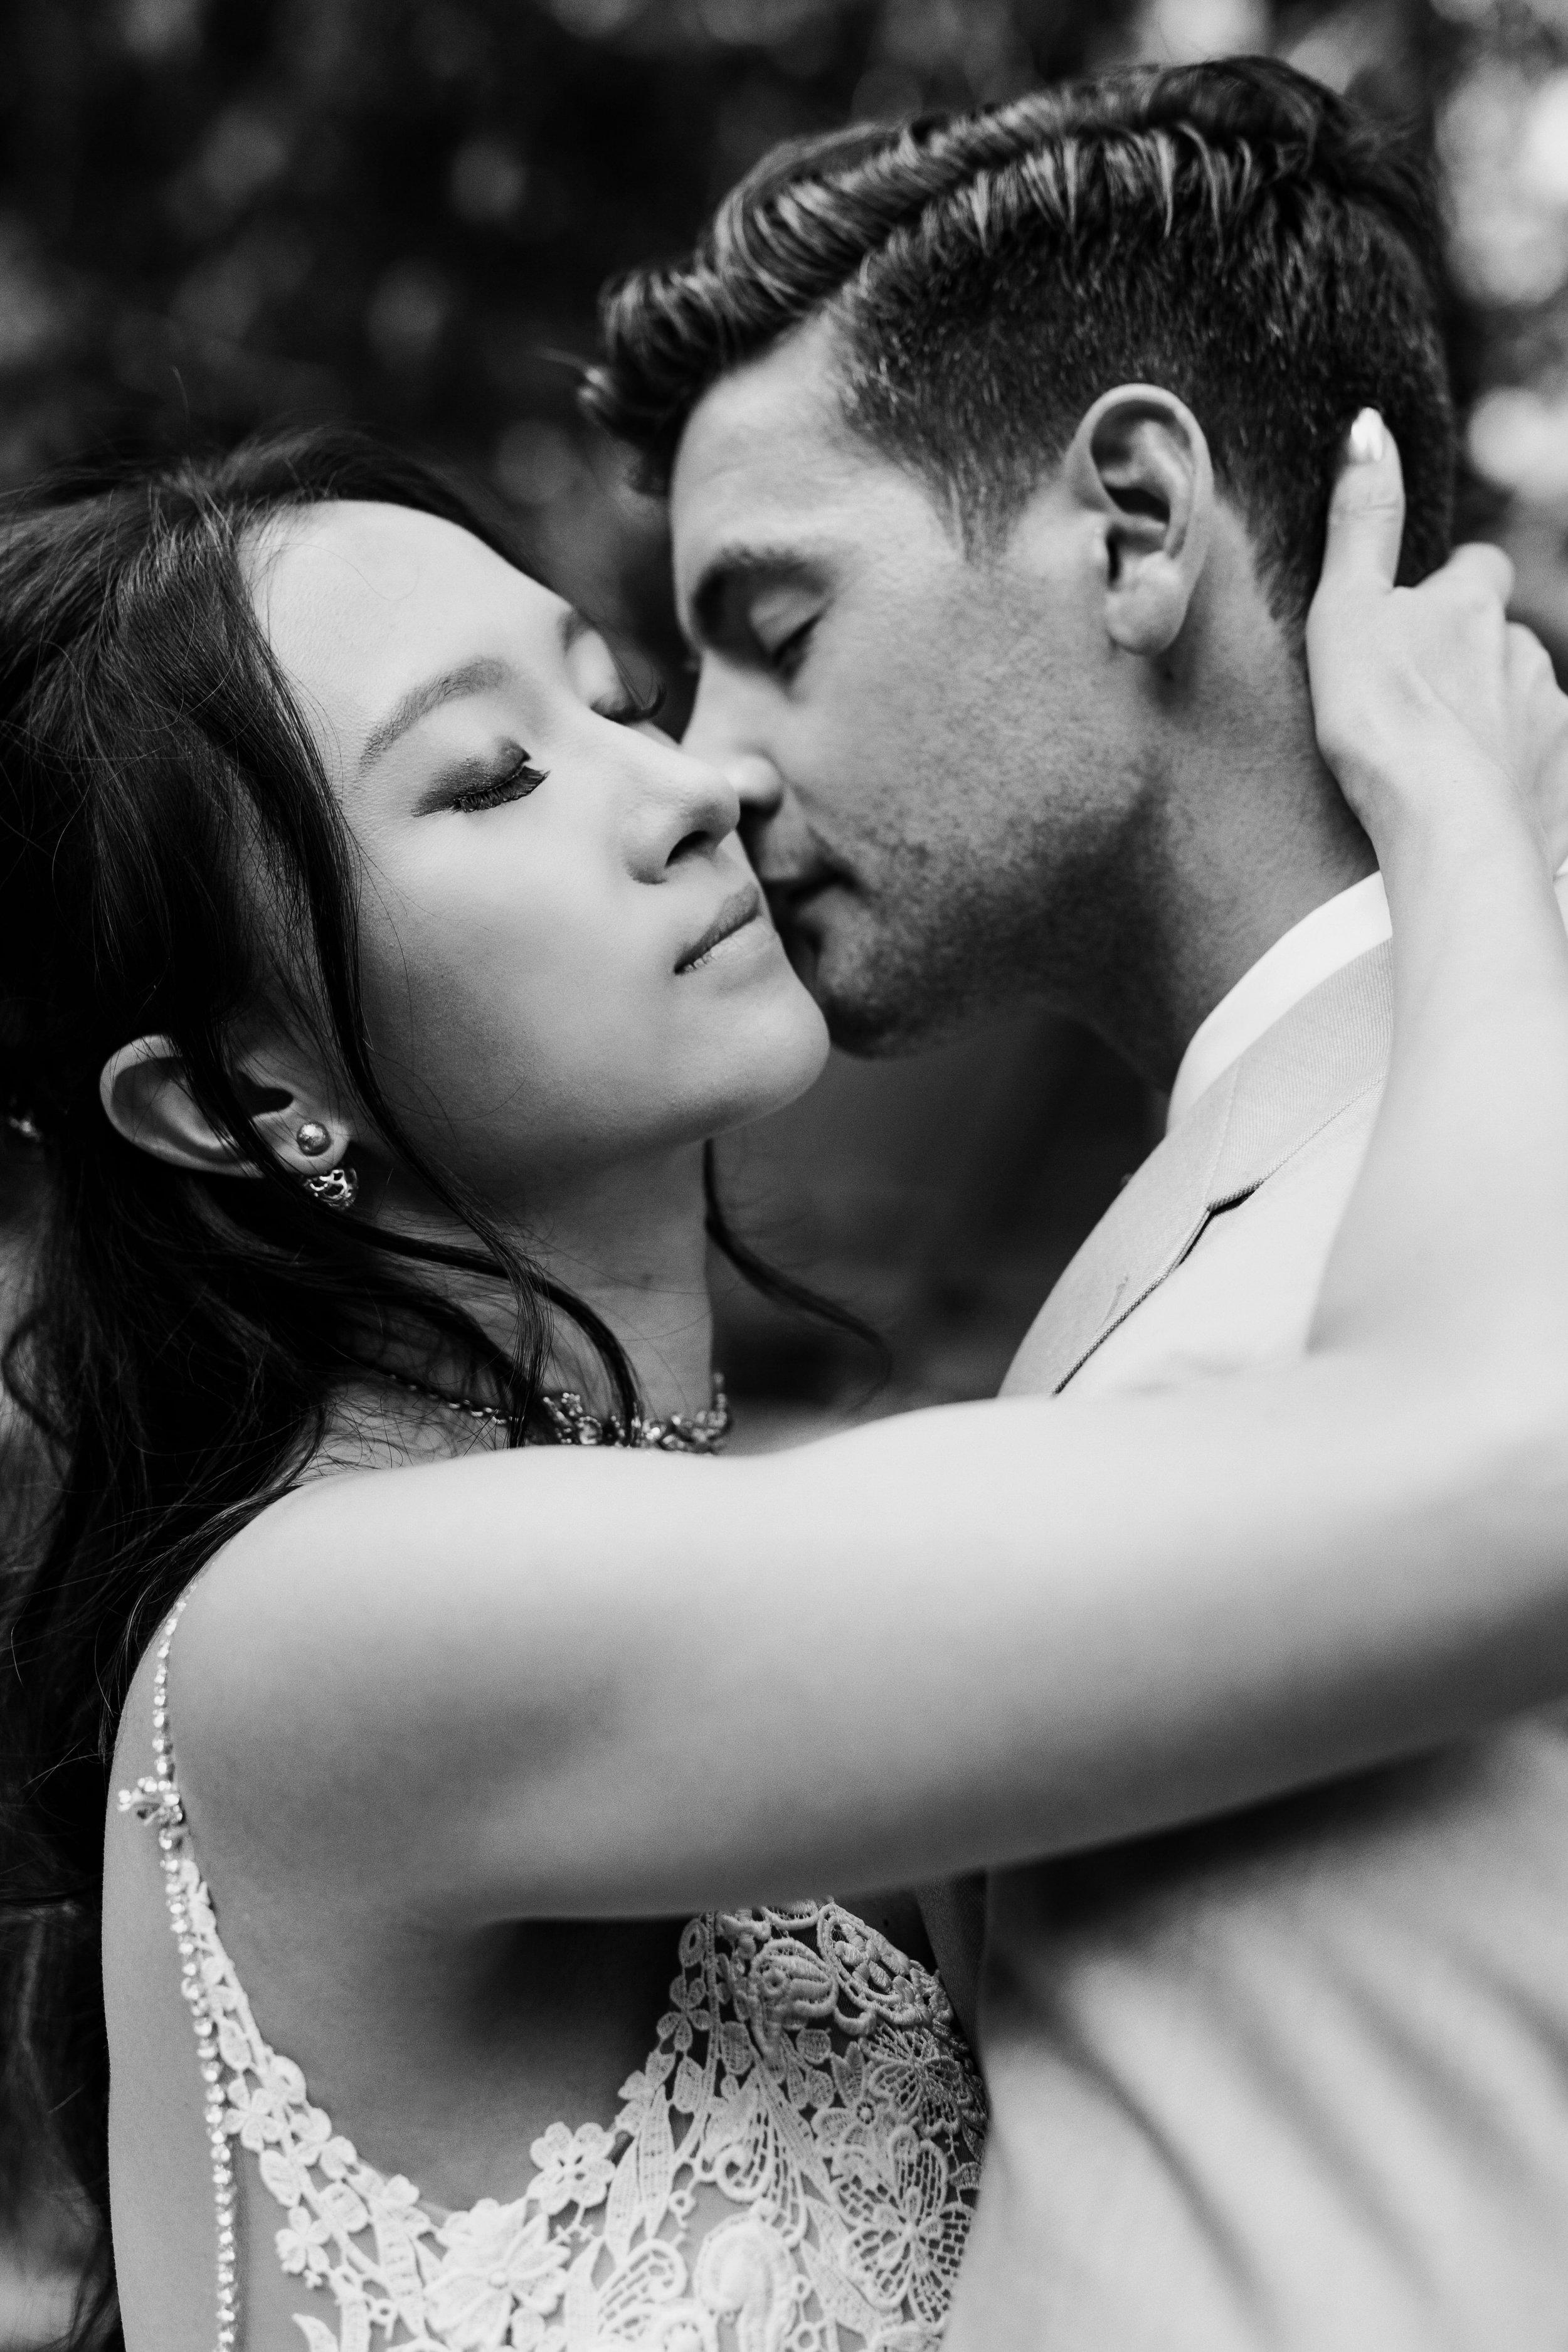 Linwood House Wedding Photos - Roberts Creek Wedding Photos - Vancouver Wedding Photographer & Videographer - Sunshine Coast Wedding Photos - Sunshine Coast Wedding Photographer - Jennifer Picard Photography - IMG_8061-2.jpg